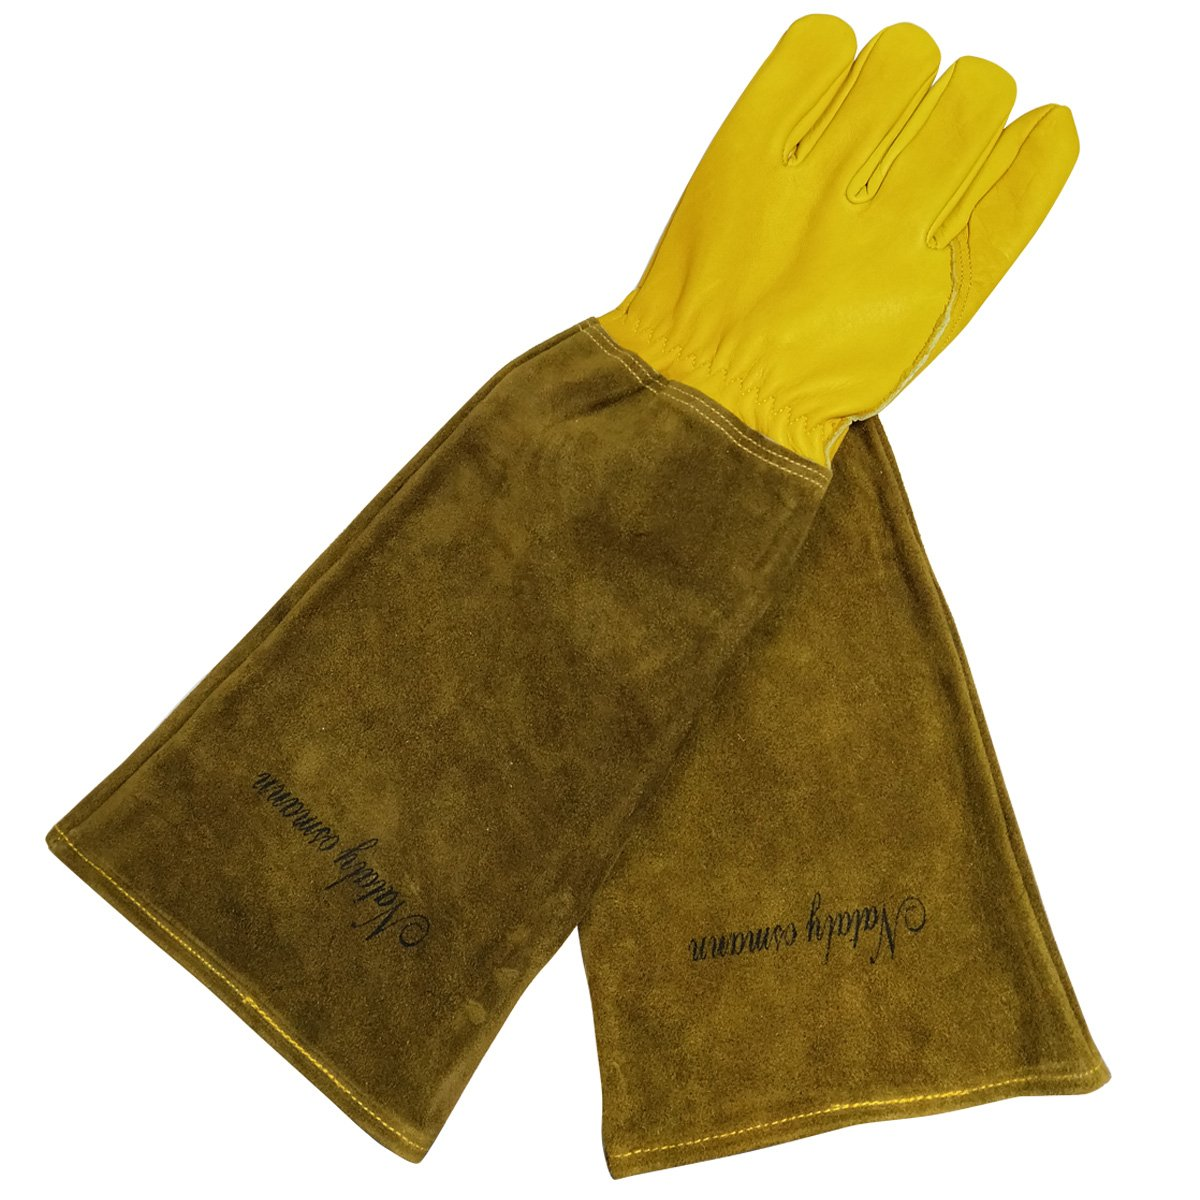 Nataly Osmann Garden Gloves,Yard Work, Thorn & Cut Proof Long Gardening Gloves, Premium Cowhide Gloves Puncture Resistant